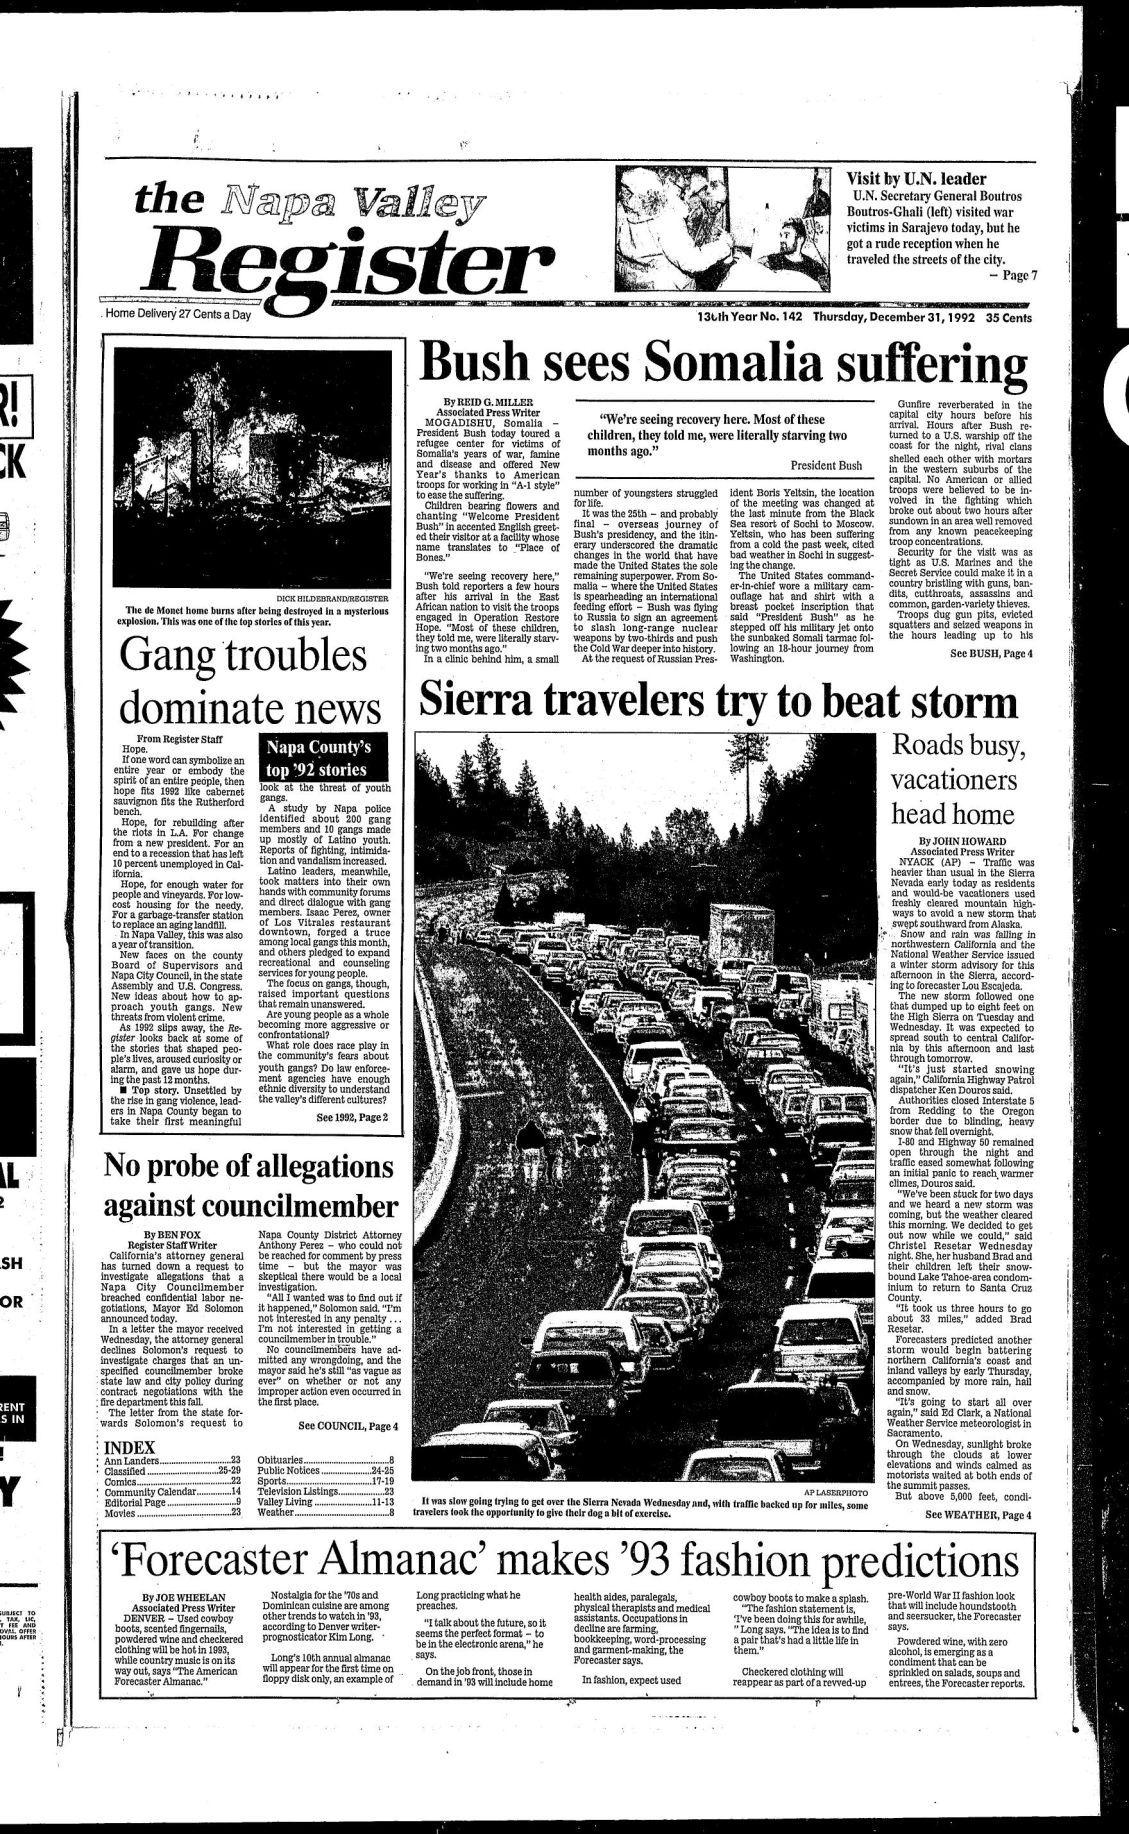 Dec. 31, 1992